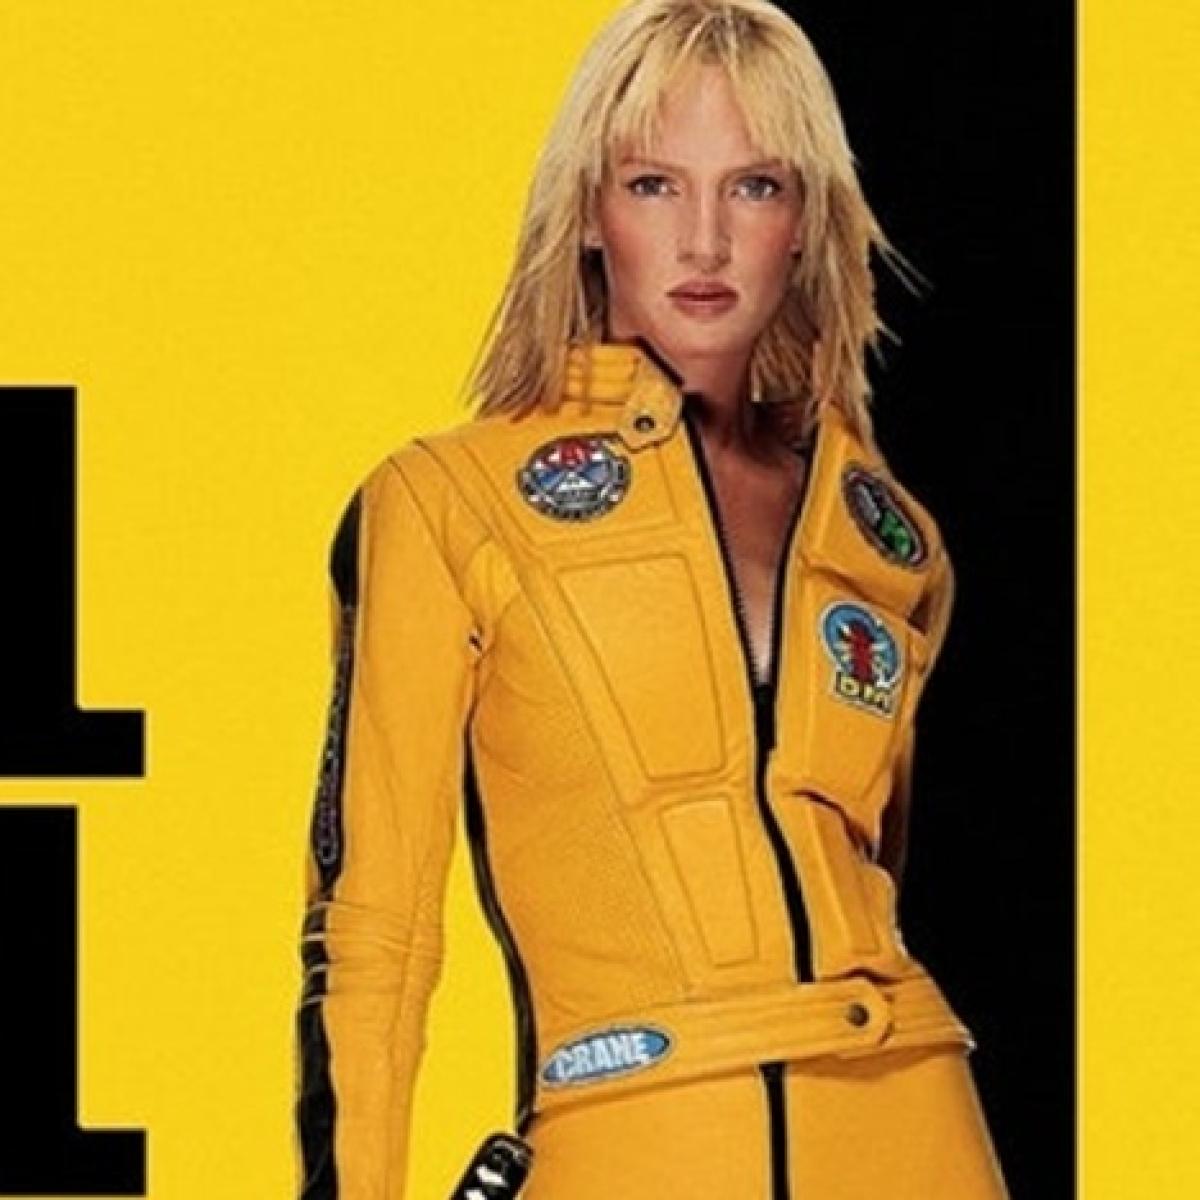 Quentin Tarantino reveals 'Kill Bill: Vol. 3' is definitely on the cards